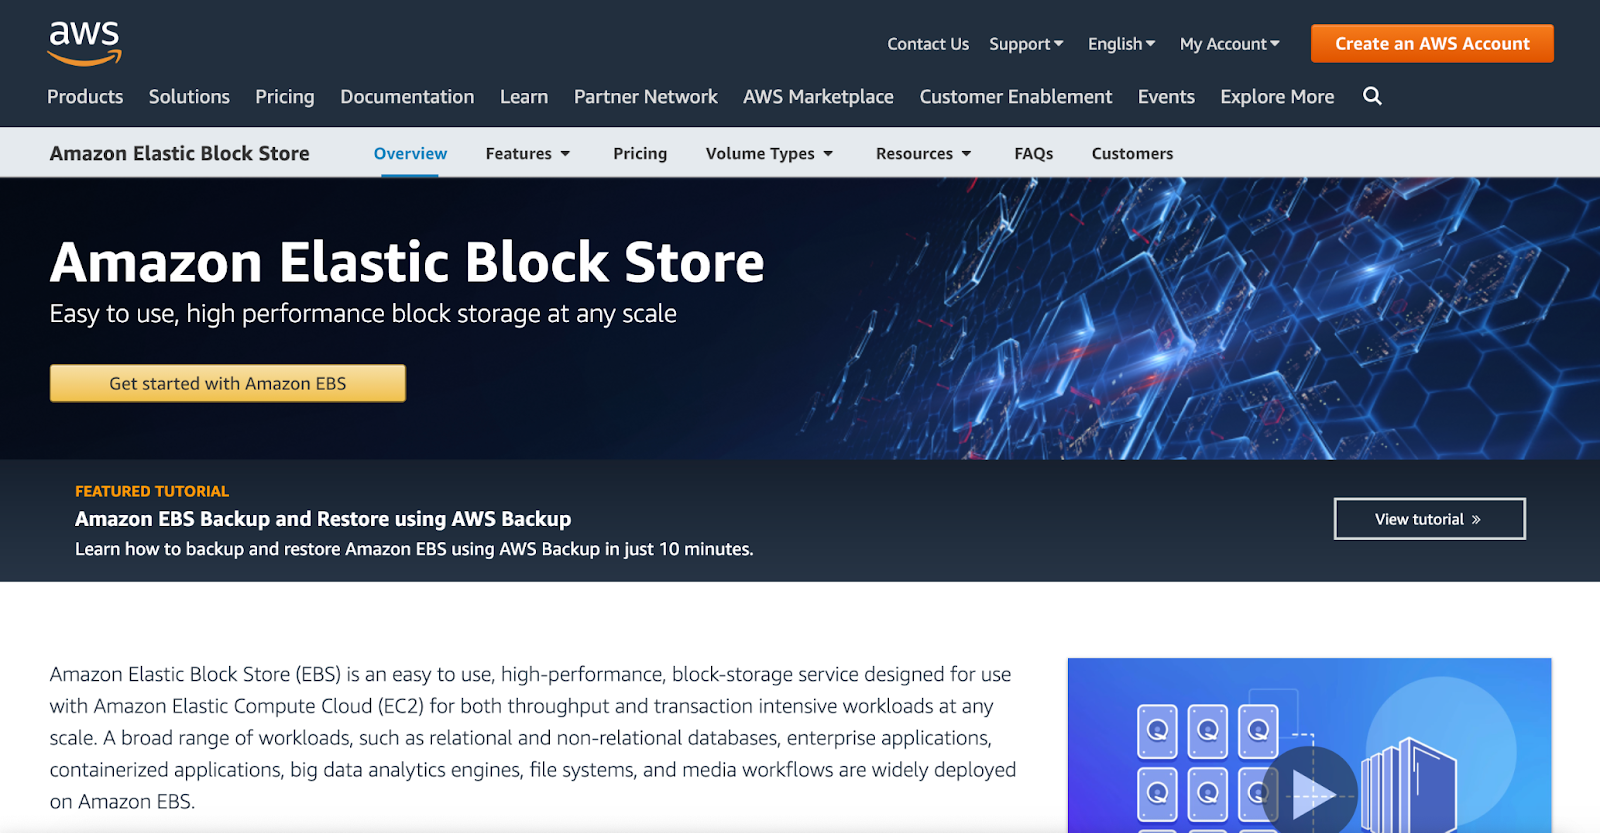 amazon elastic block store